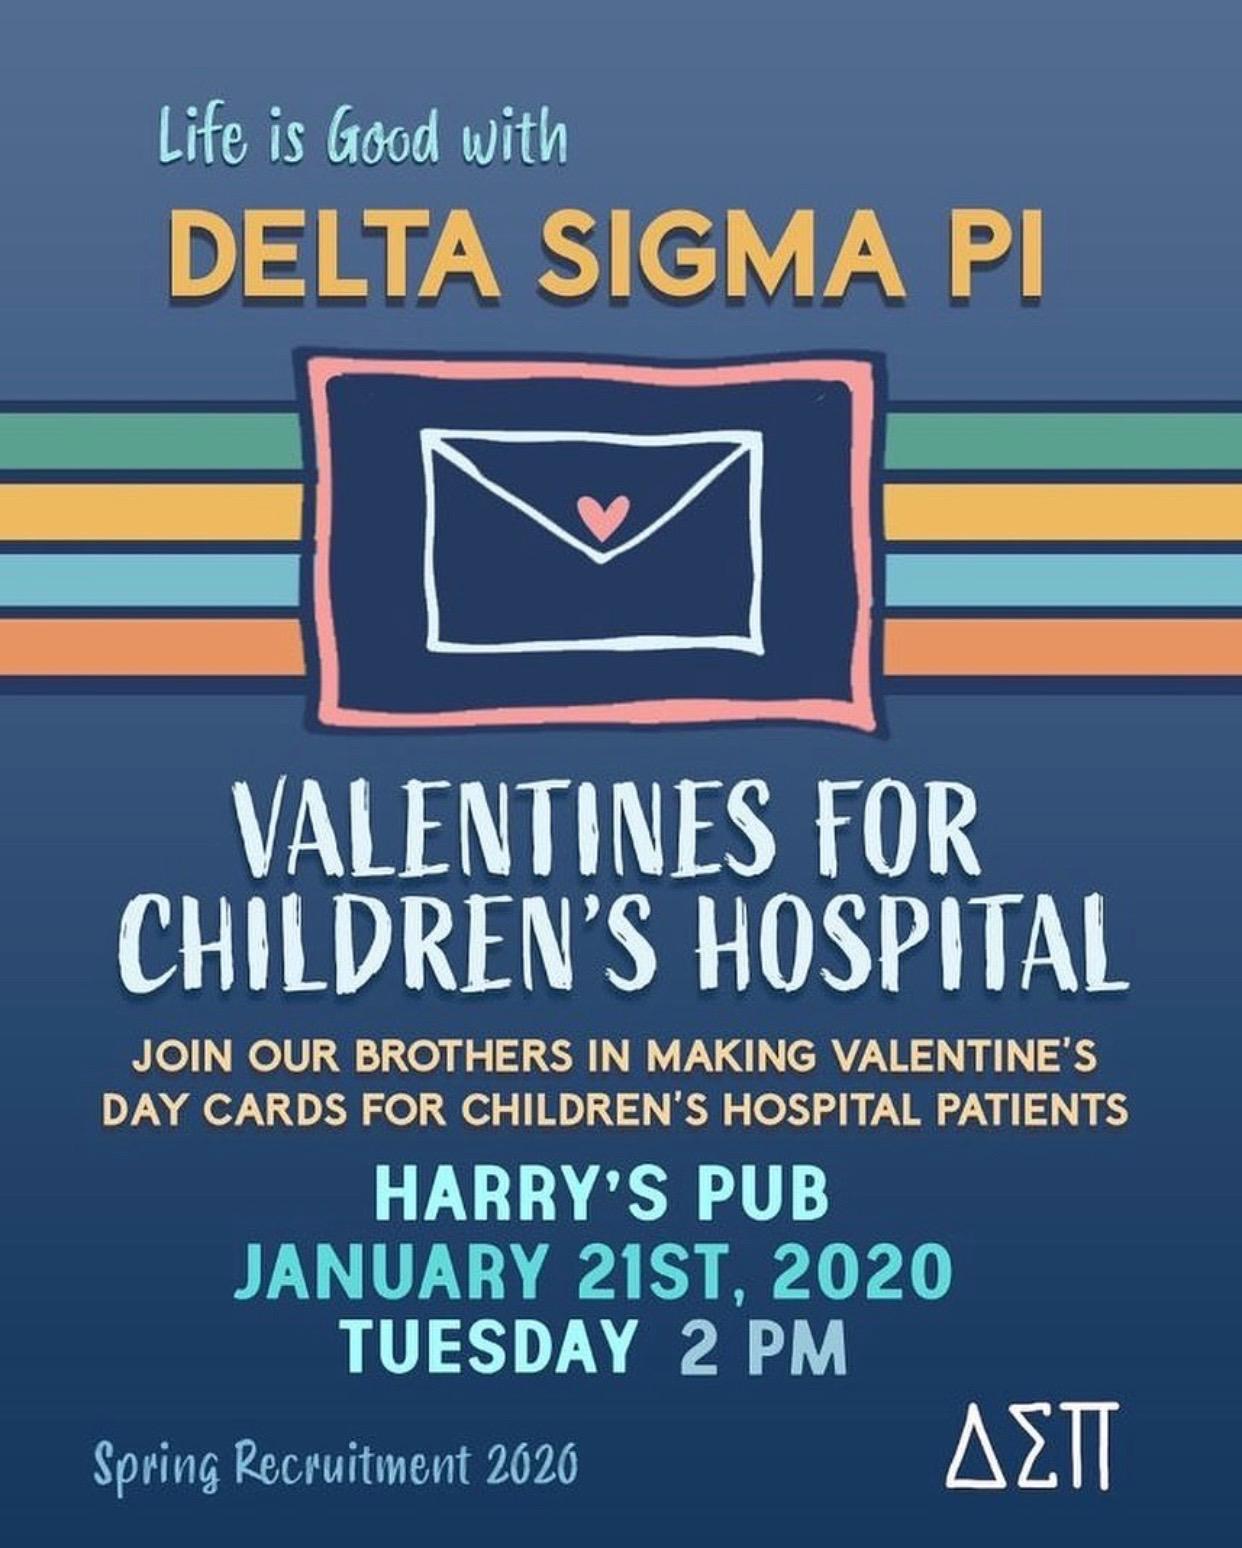 #2 Valentines for Children's Hospital